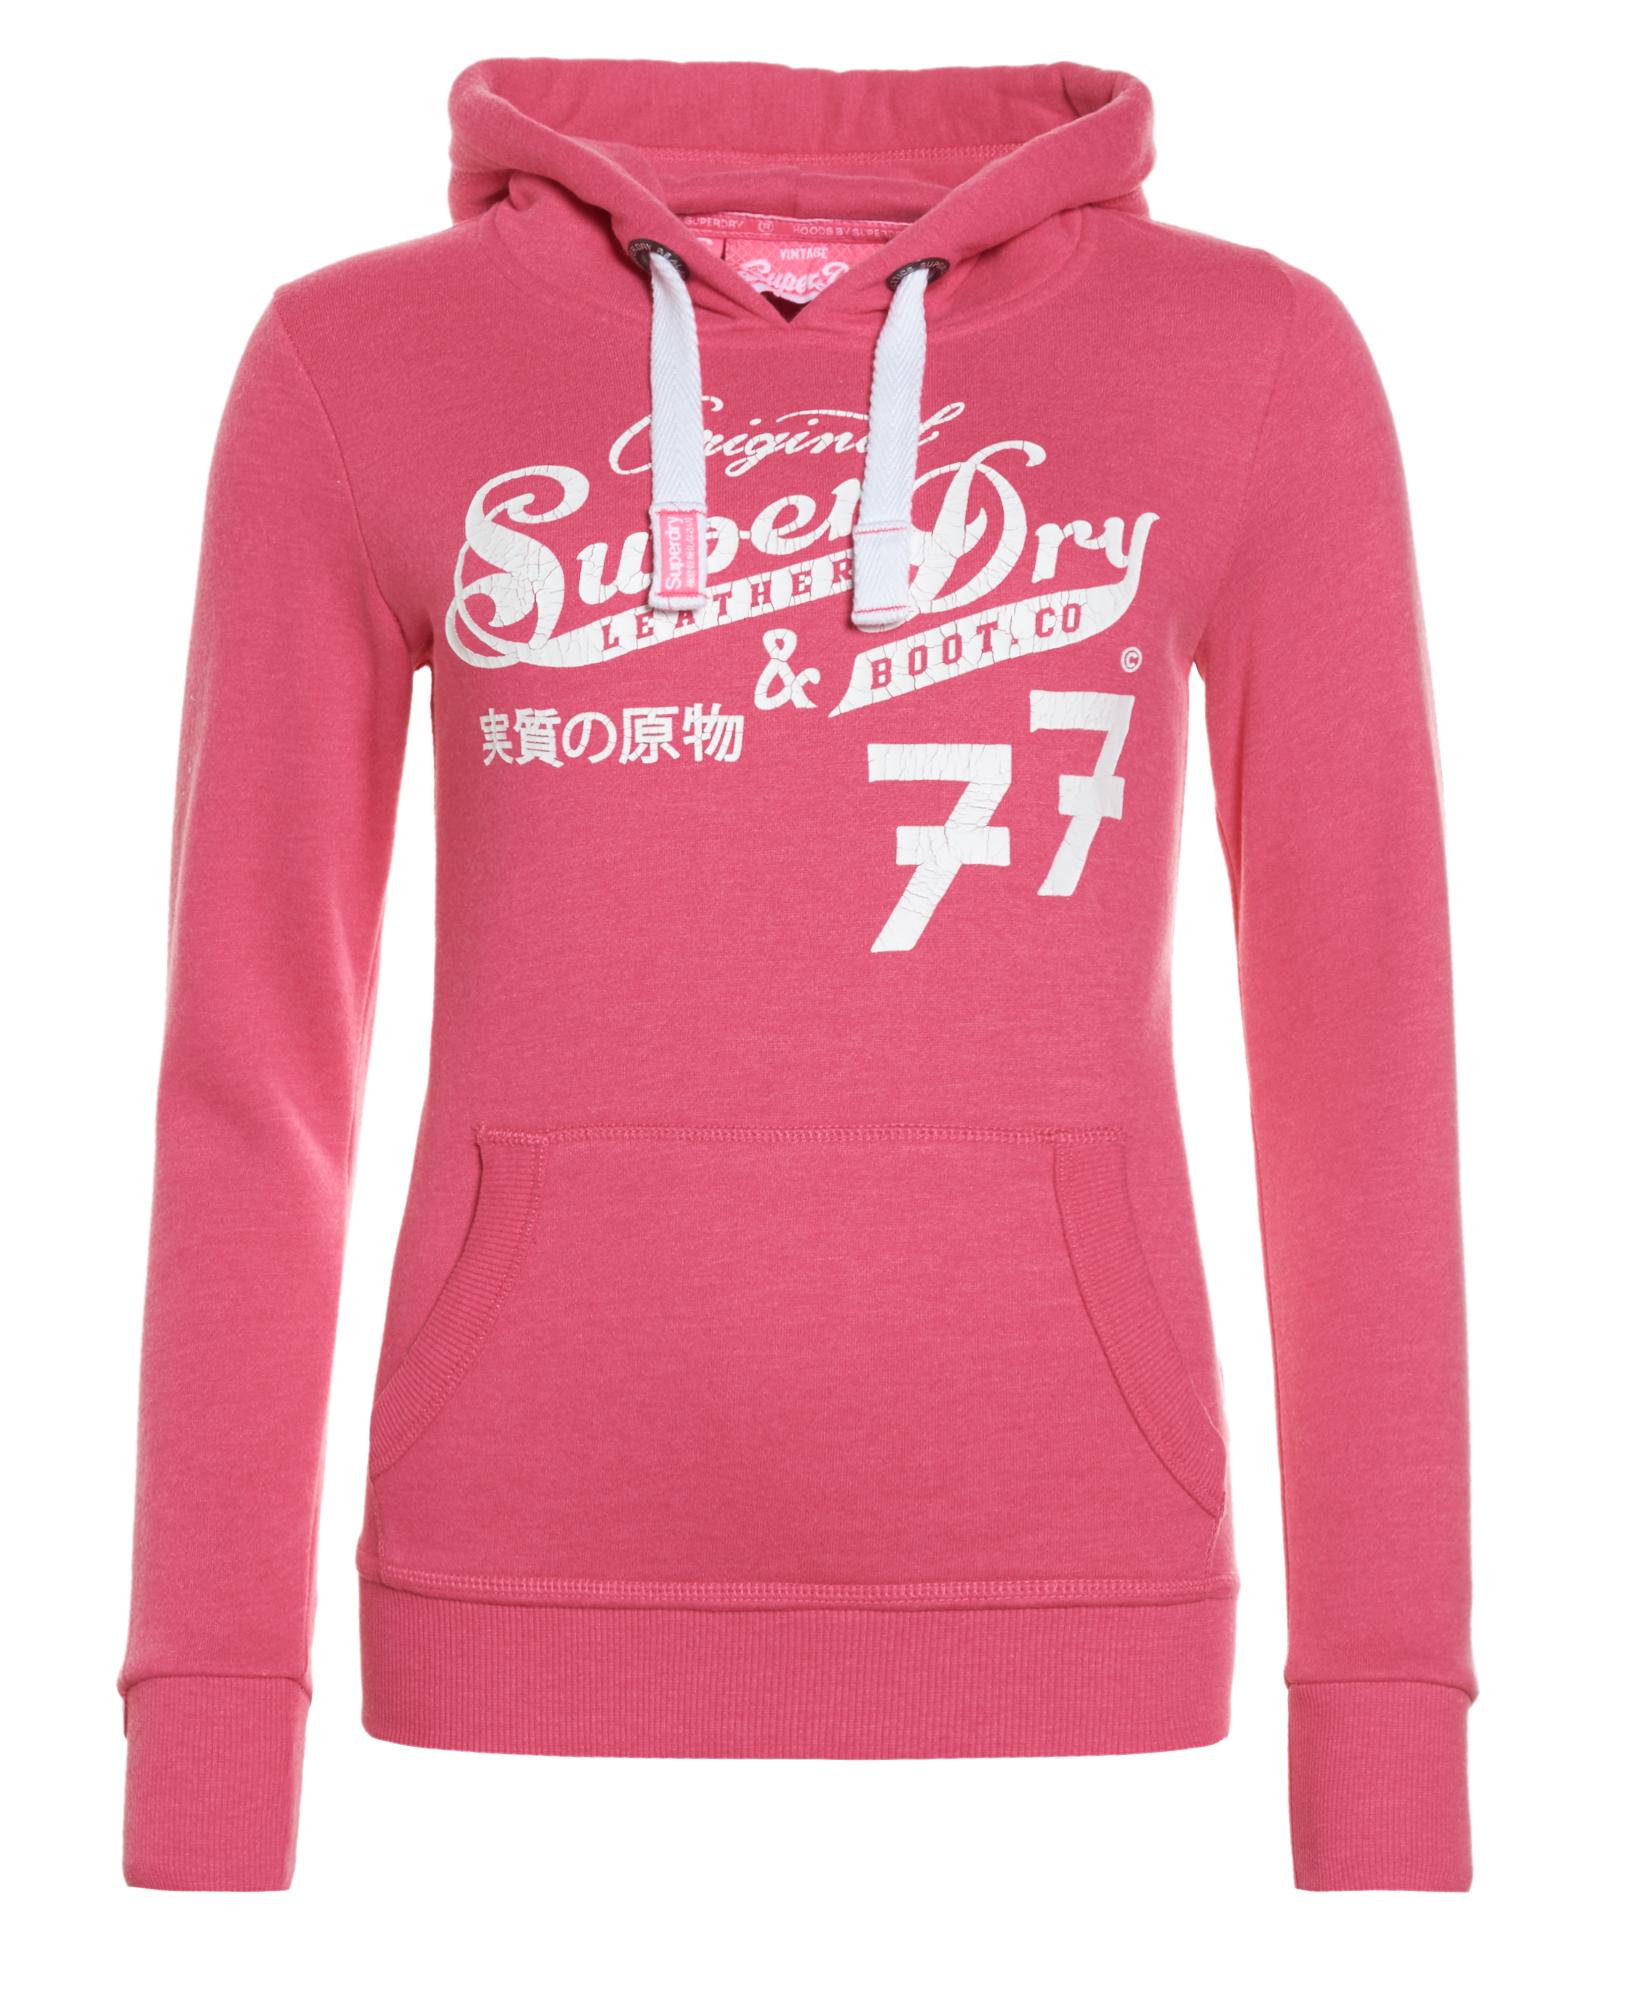 york university hoodie. new womens superdry original 77 entry hoodie paradise pink marl york university e